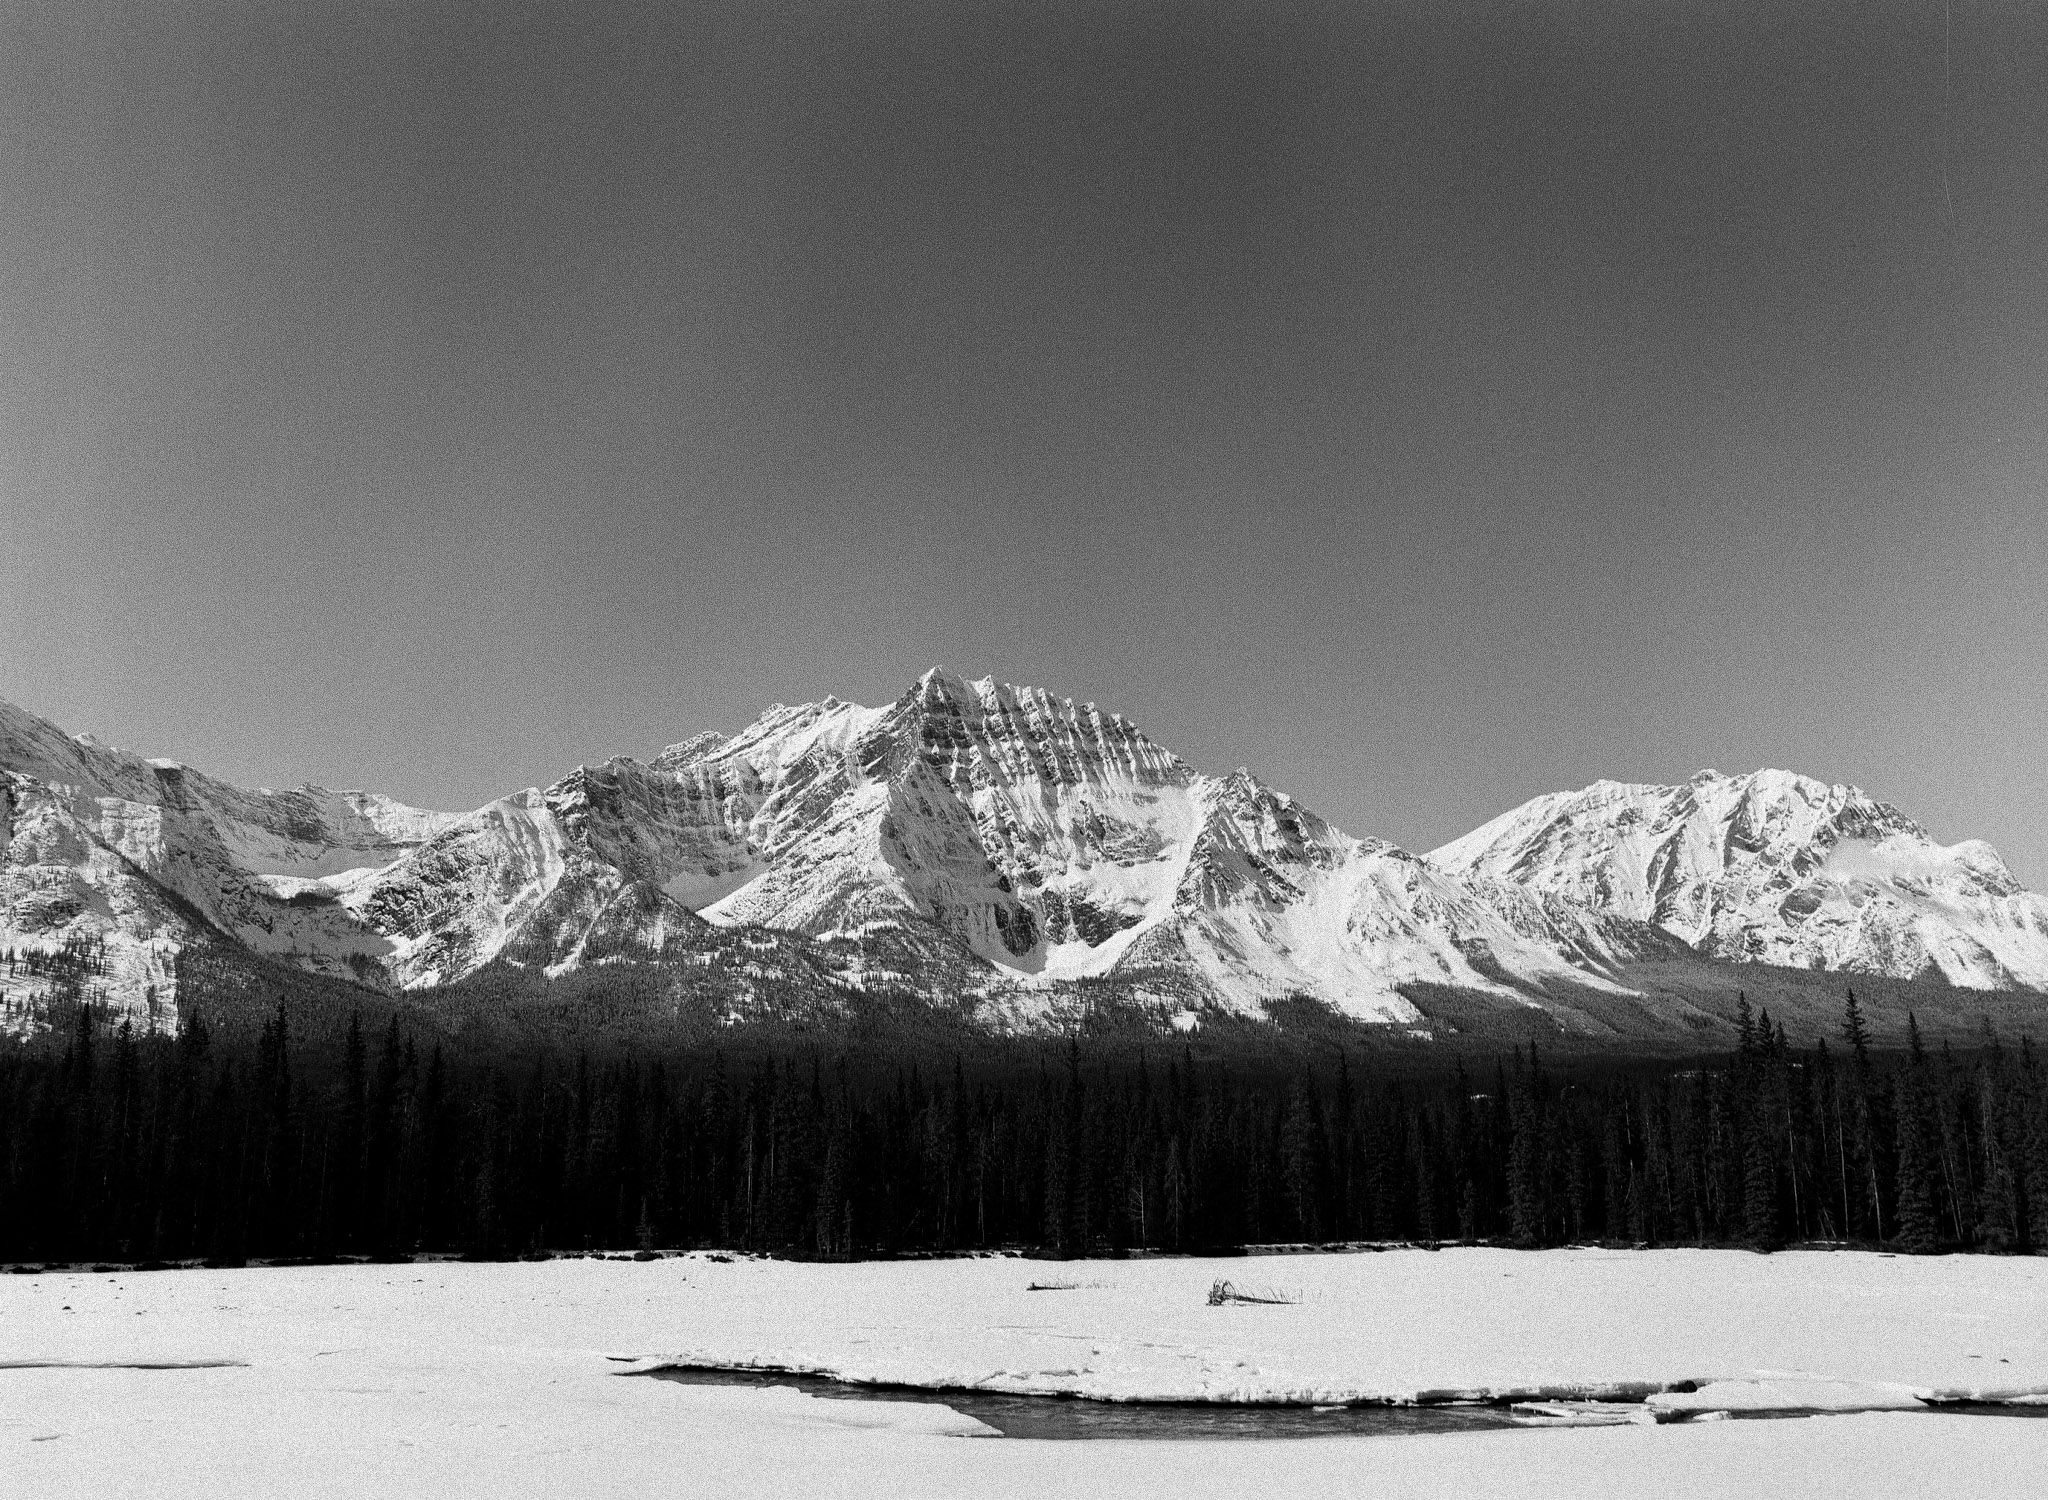 The Athabasca River, Jasper National Park. // TMAX400